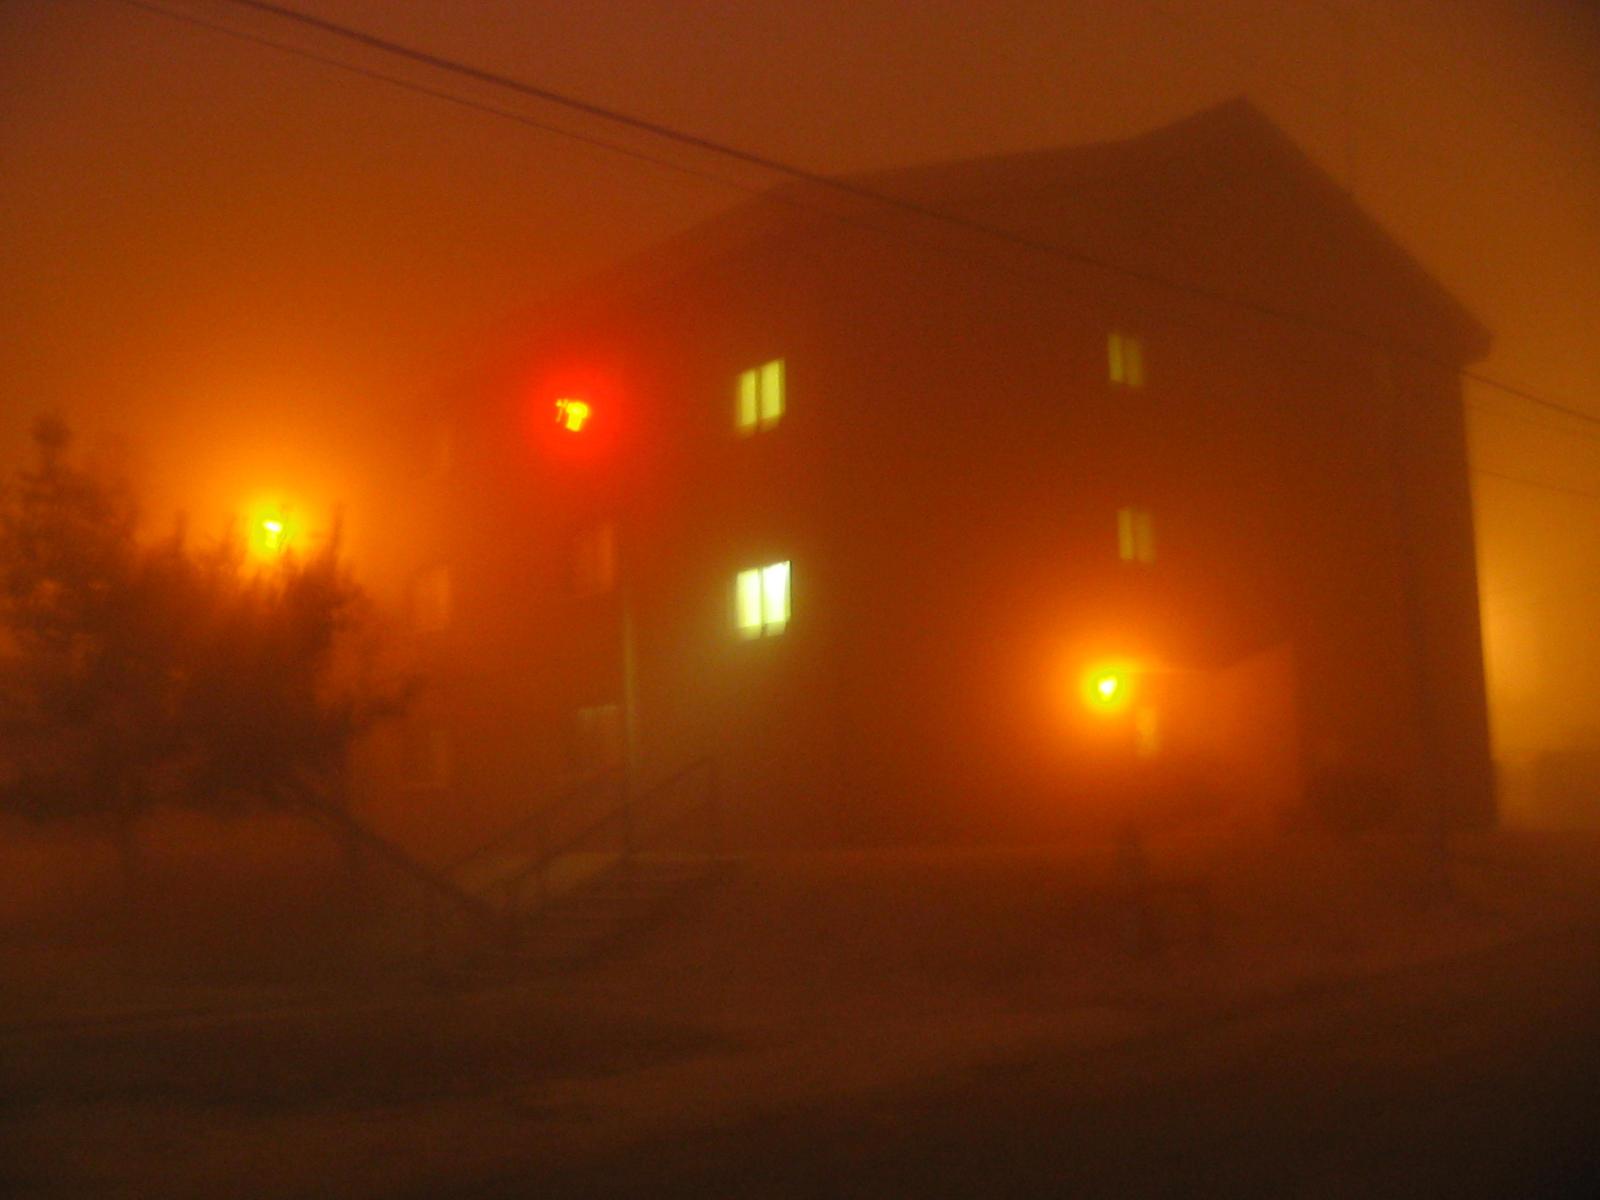 Foggy Barracks by zostix